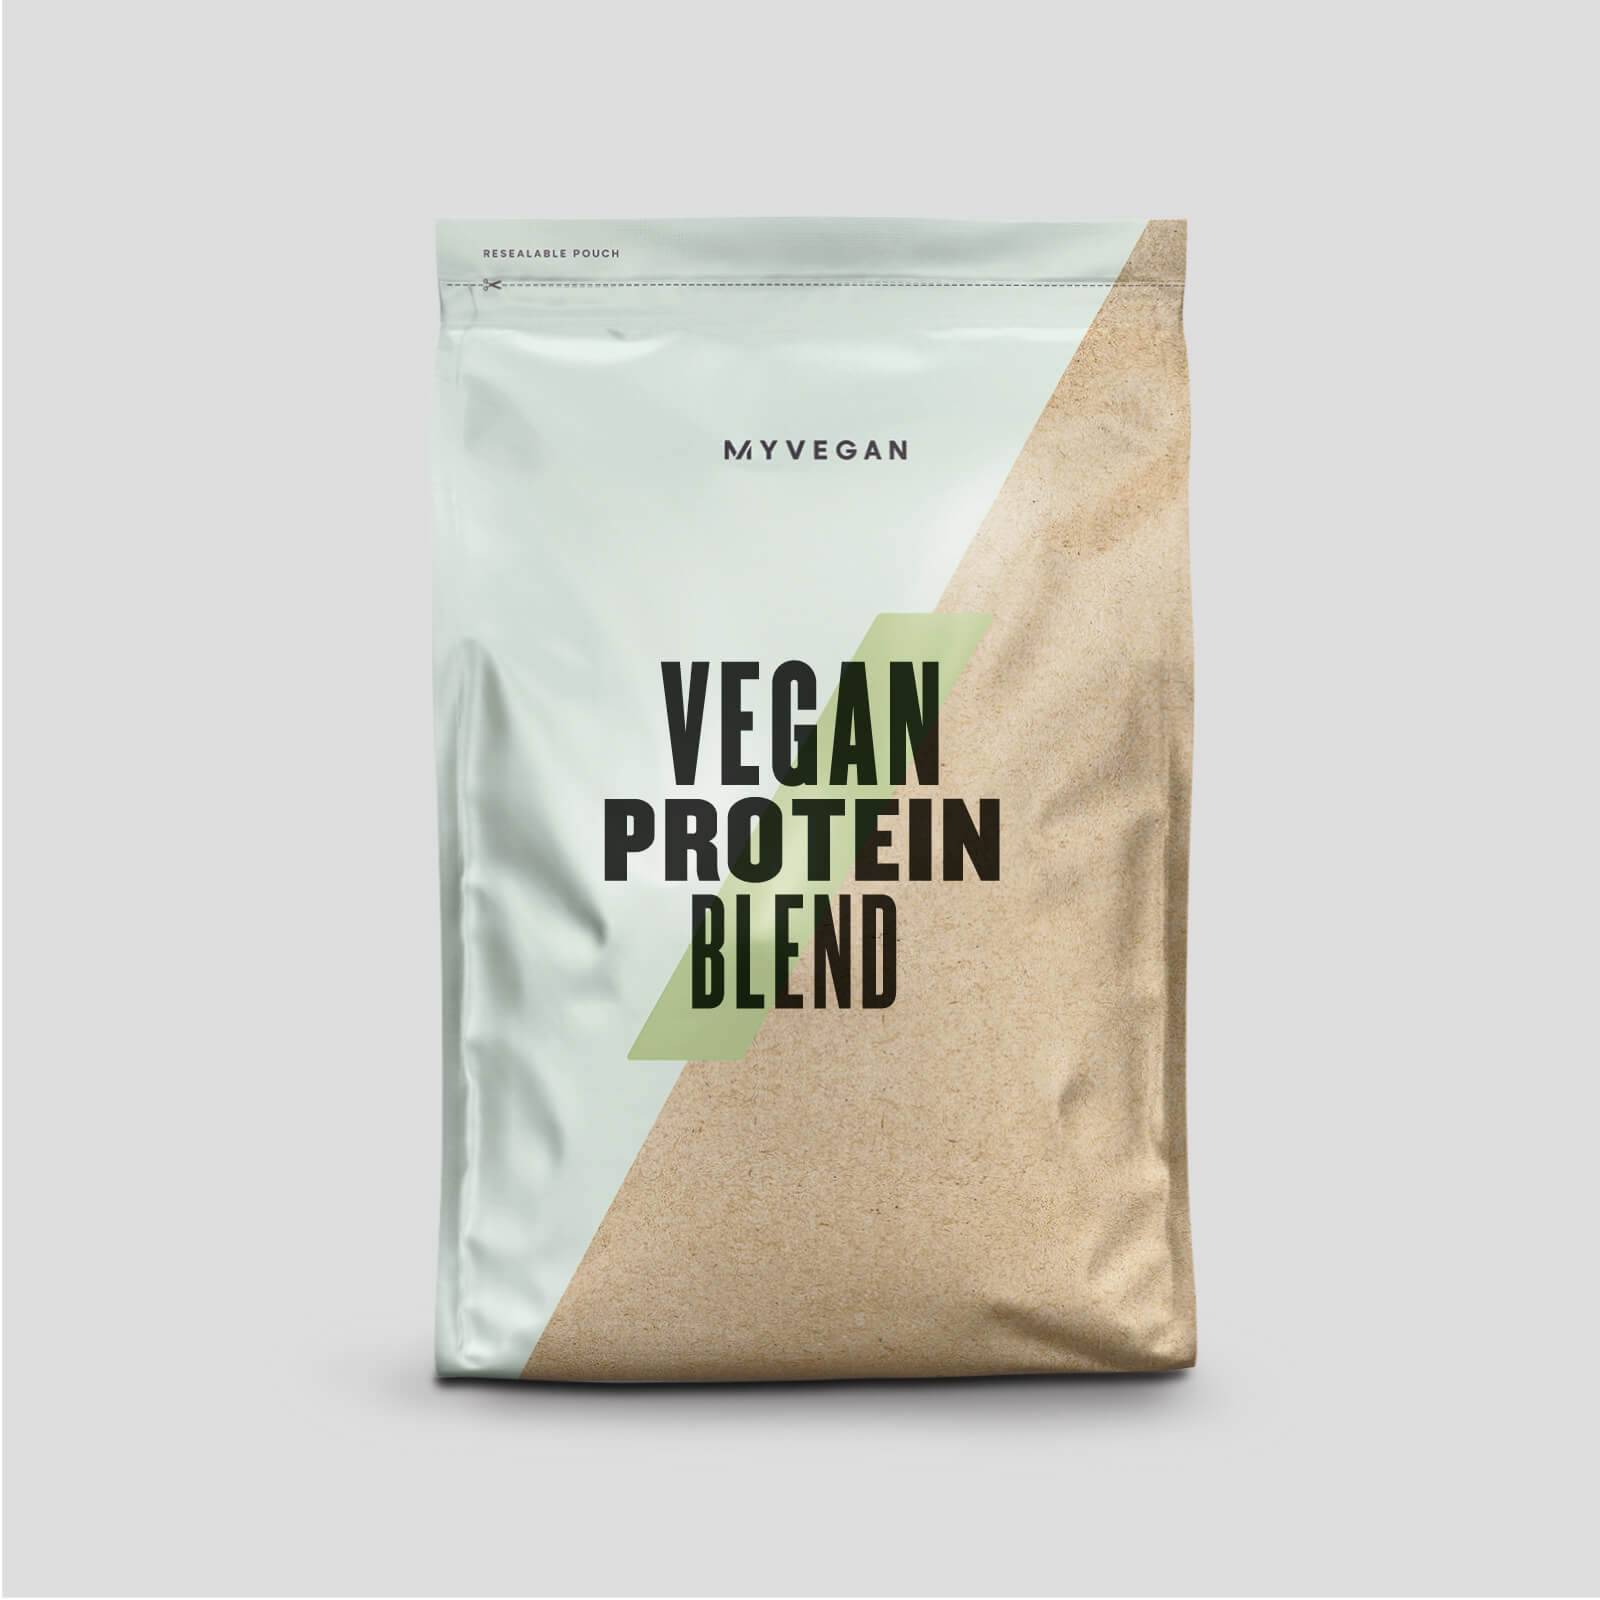 Myvegan Mélange de protéines végétales - 250g - Coffee & Walnut